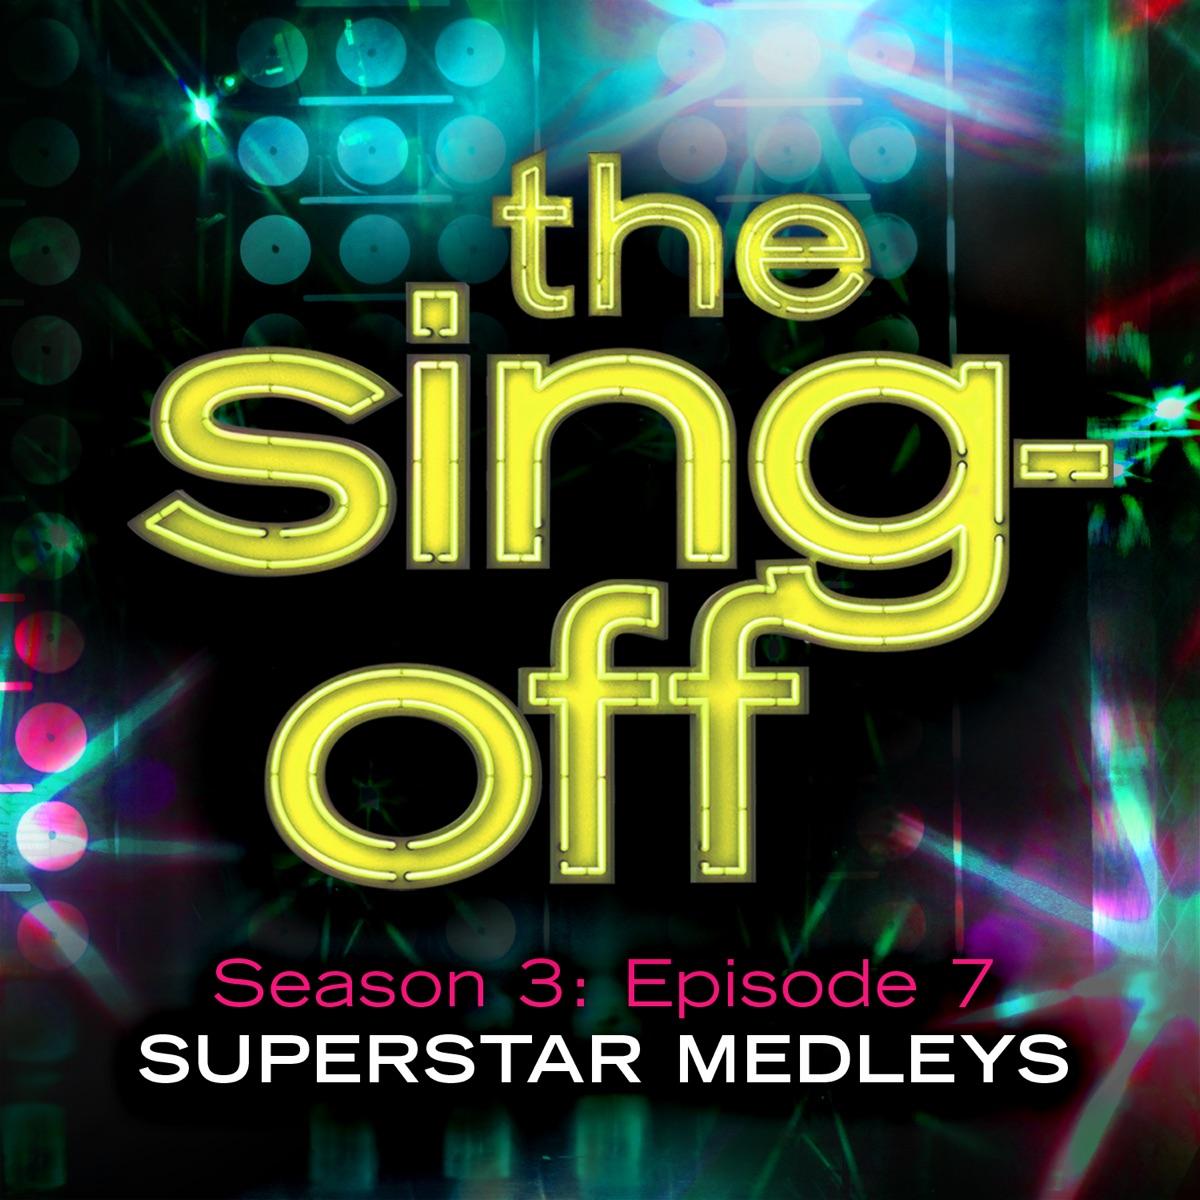 The Sing-Off Season 3 Episode 7 - Superstar Medleys Various Artists CD cover